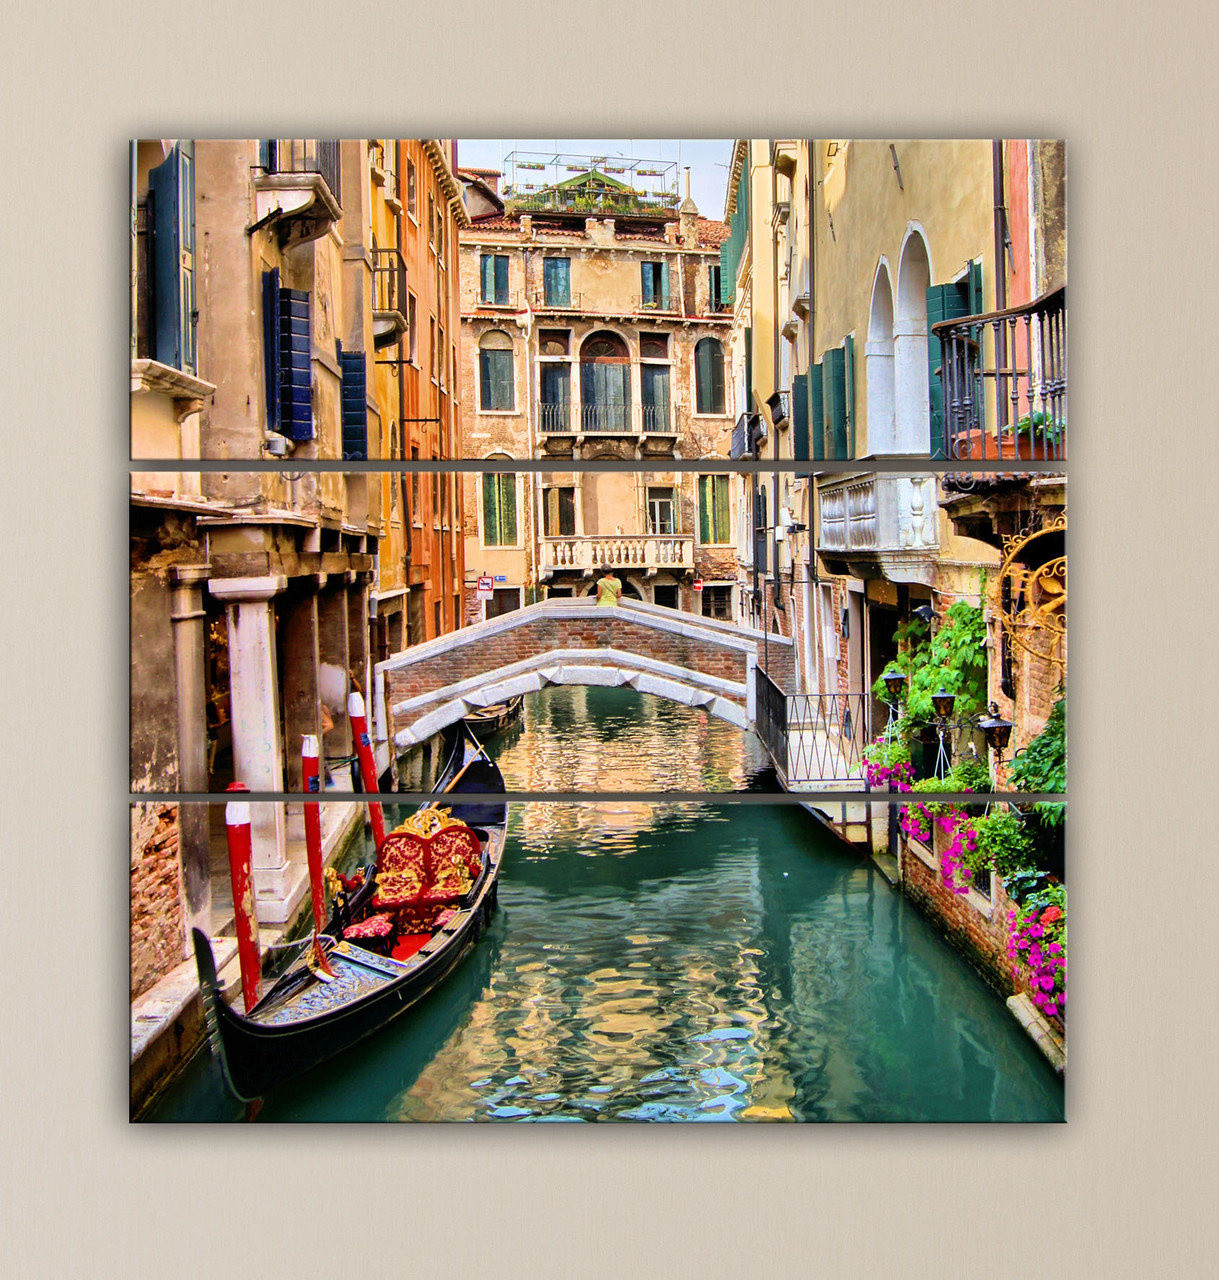 Модульная картина Улочки Венеции